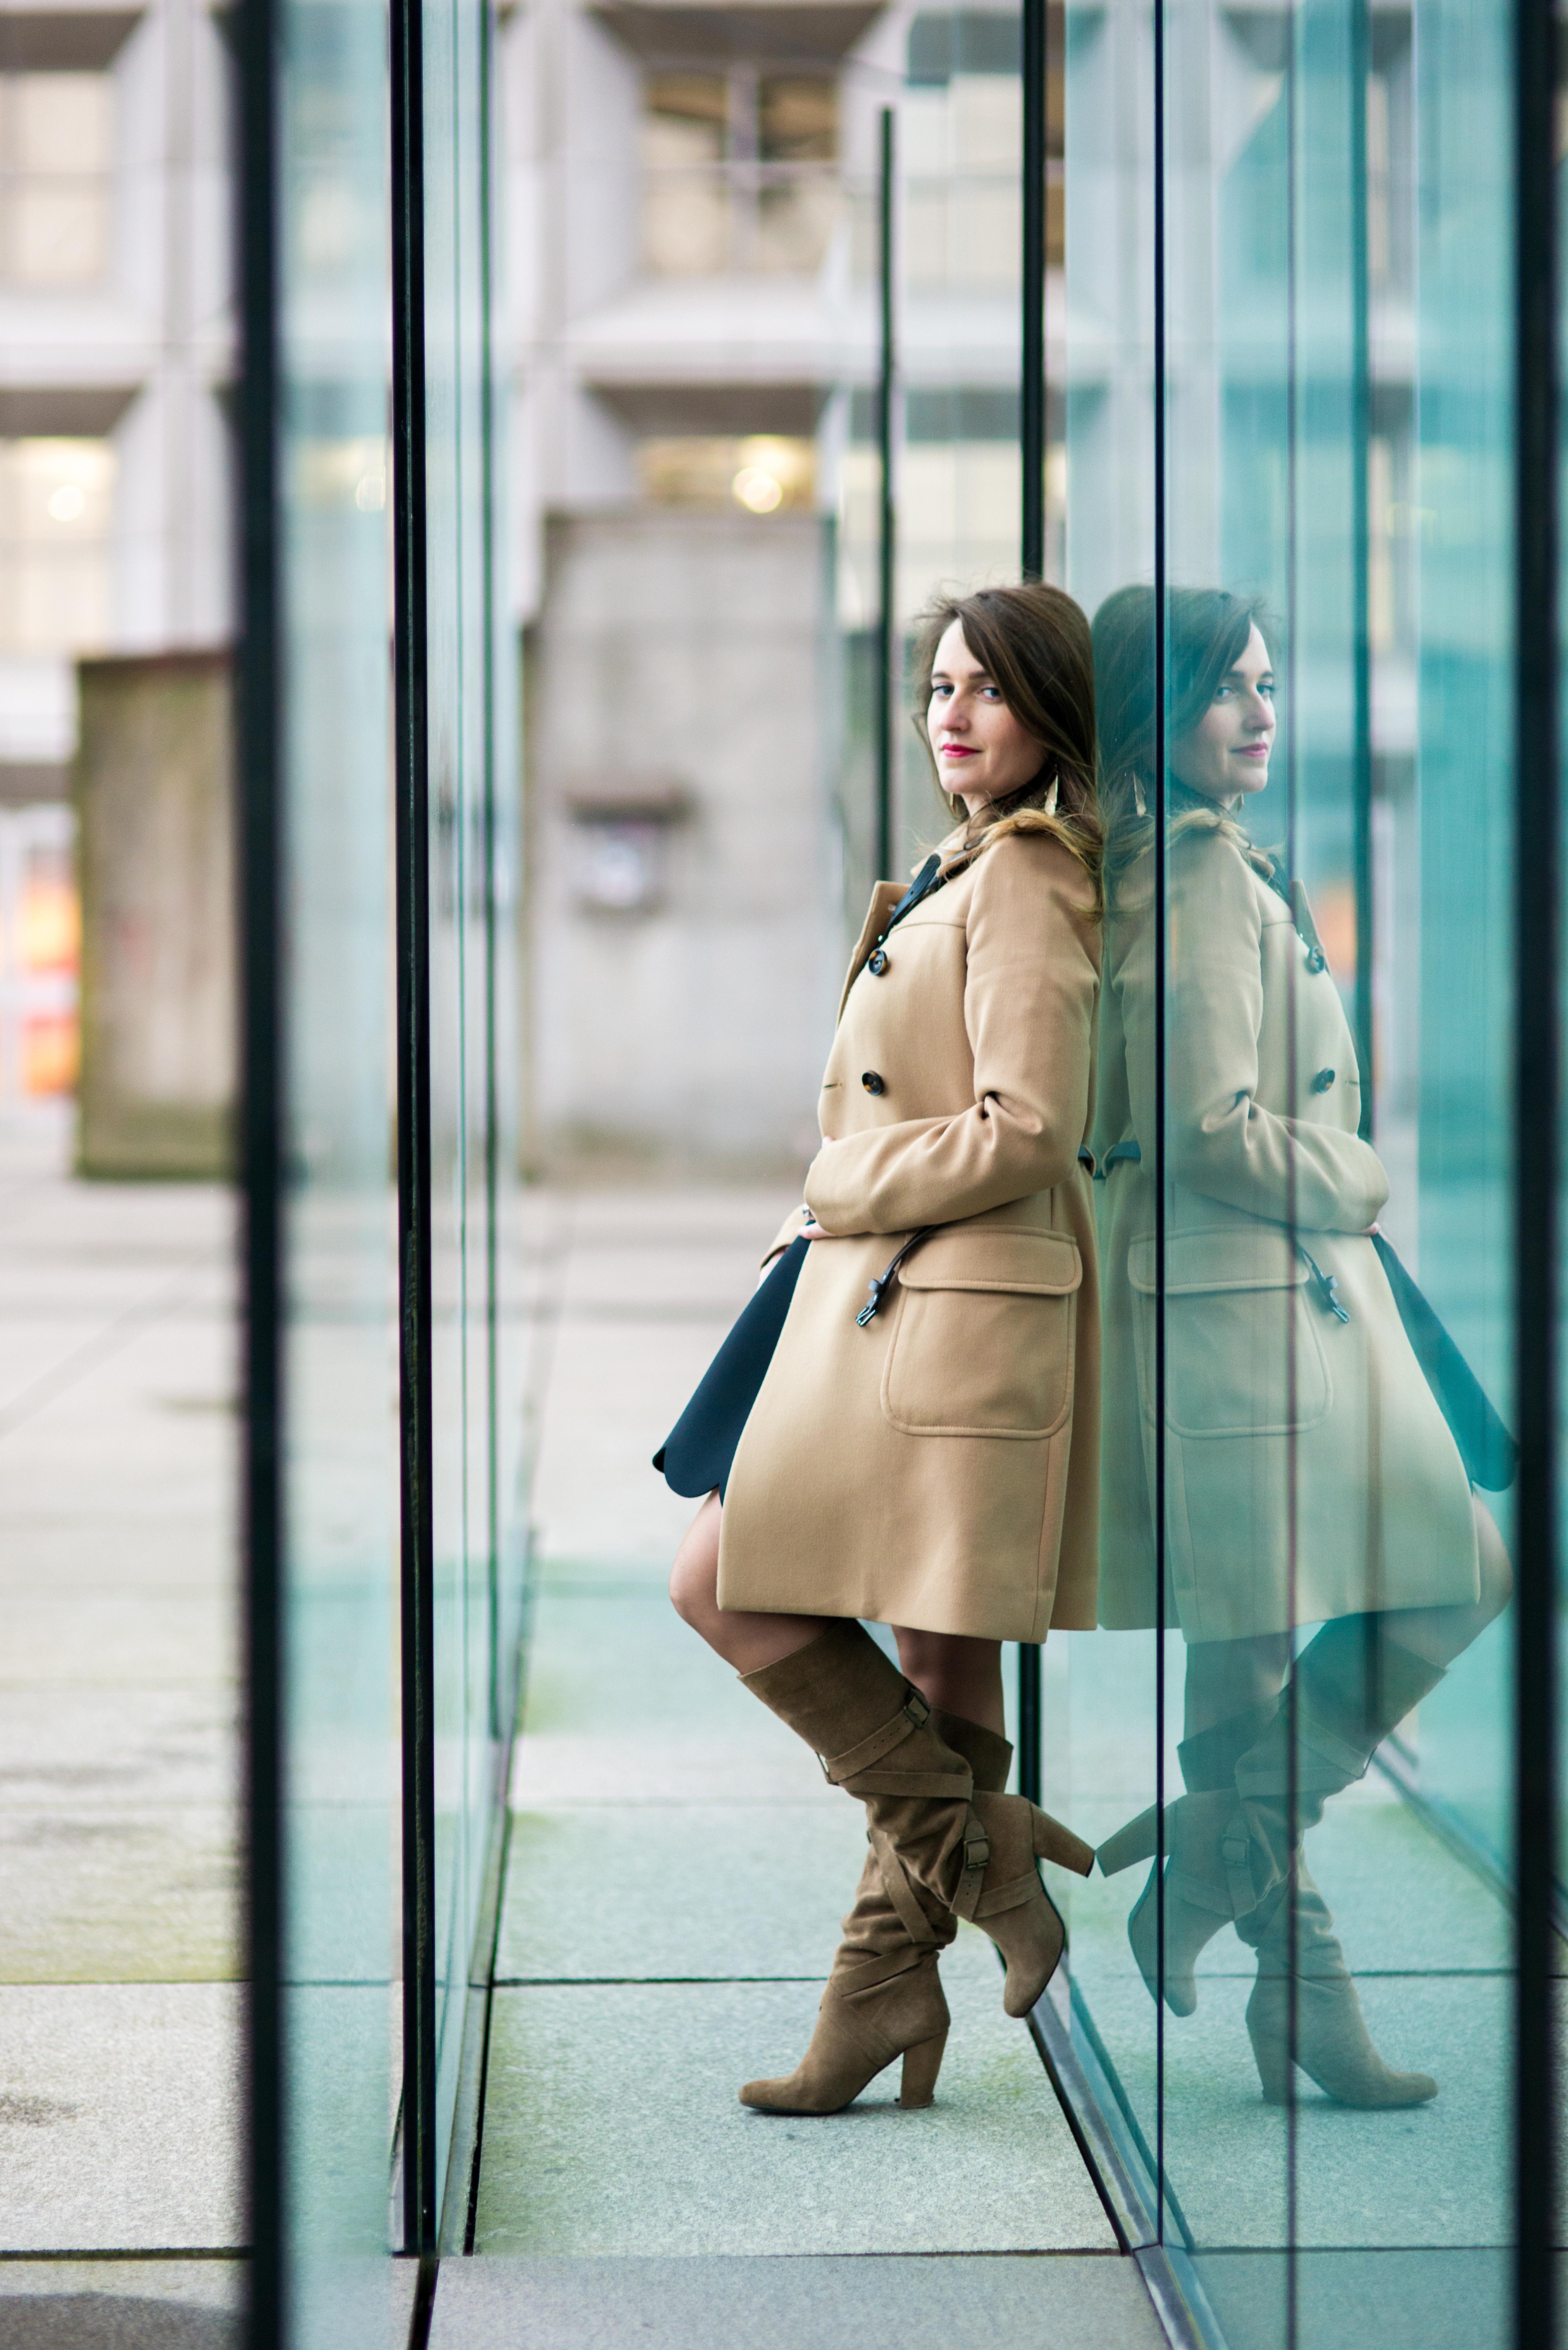 style-sophistique-modele-grandearche-ladefense-paris-fashionblogger-influencer-blouse-zara-seralynepointcom-ump_6618